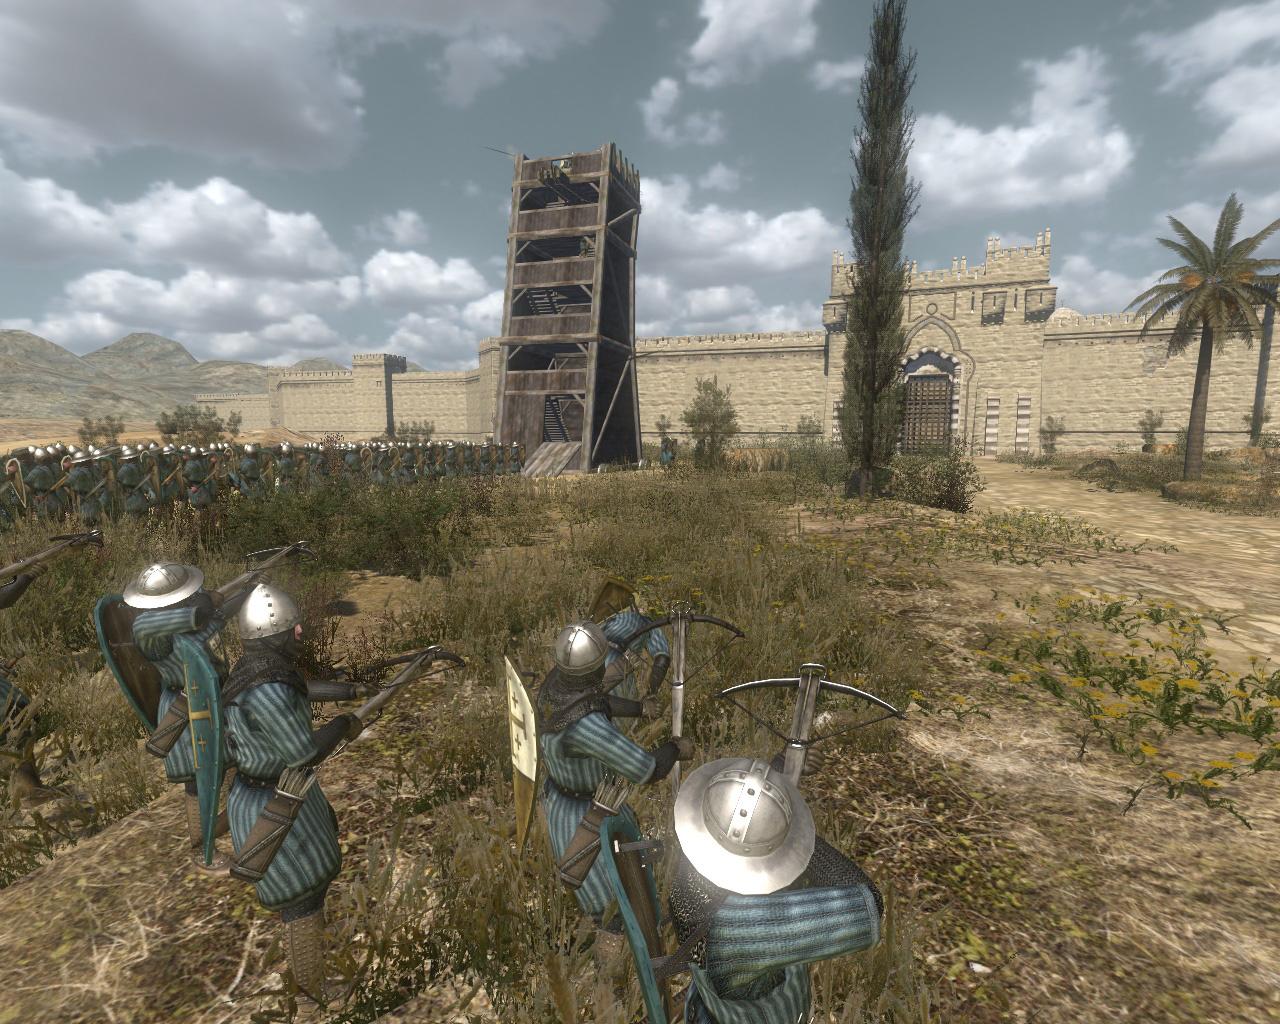 [A] Crusaders Way to Expiation (CANCELADO) - Página 3 3eef3a88e5c9